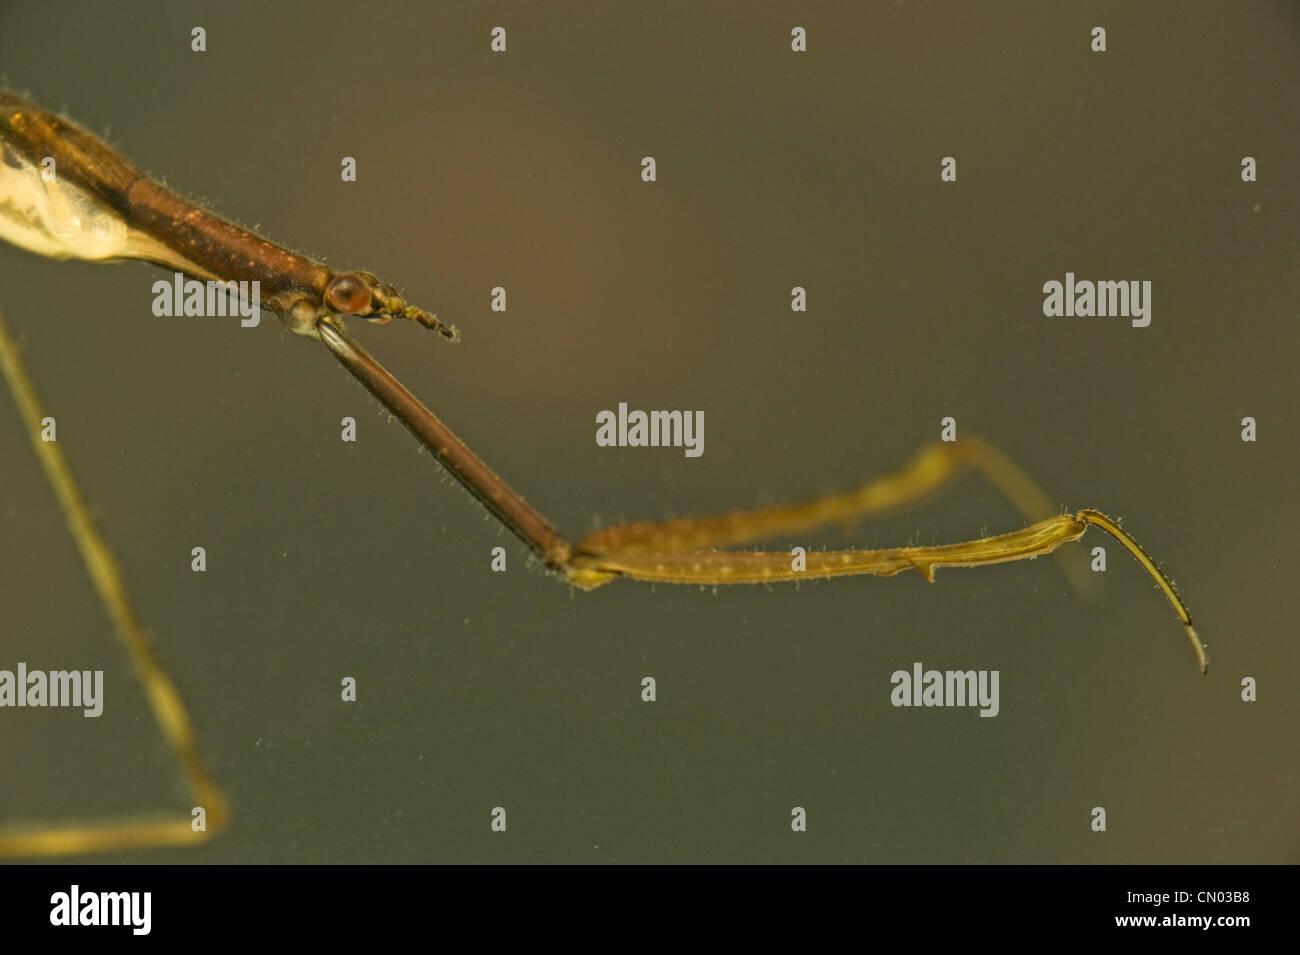 Close-up of Australian aiguille bug aka scorpion de l'eau Photo Stock